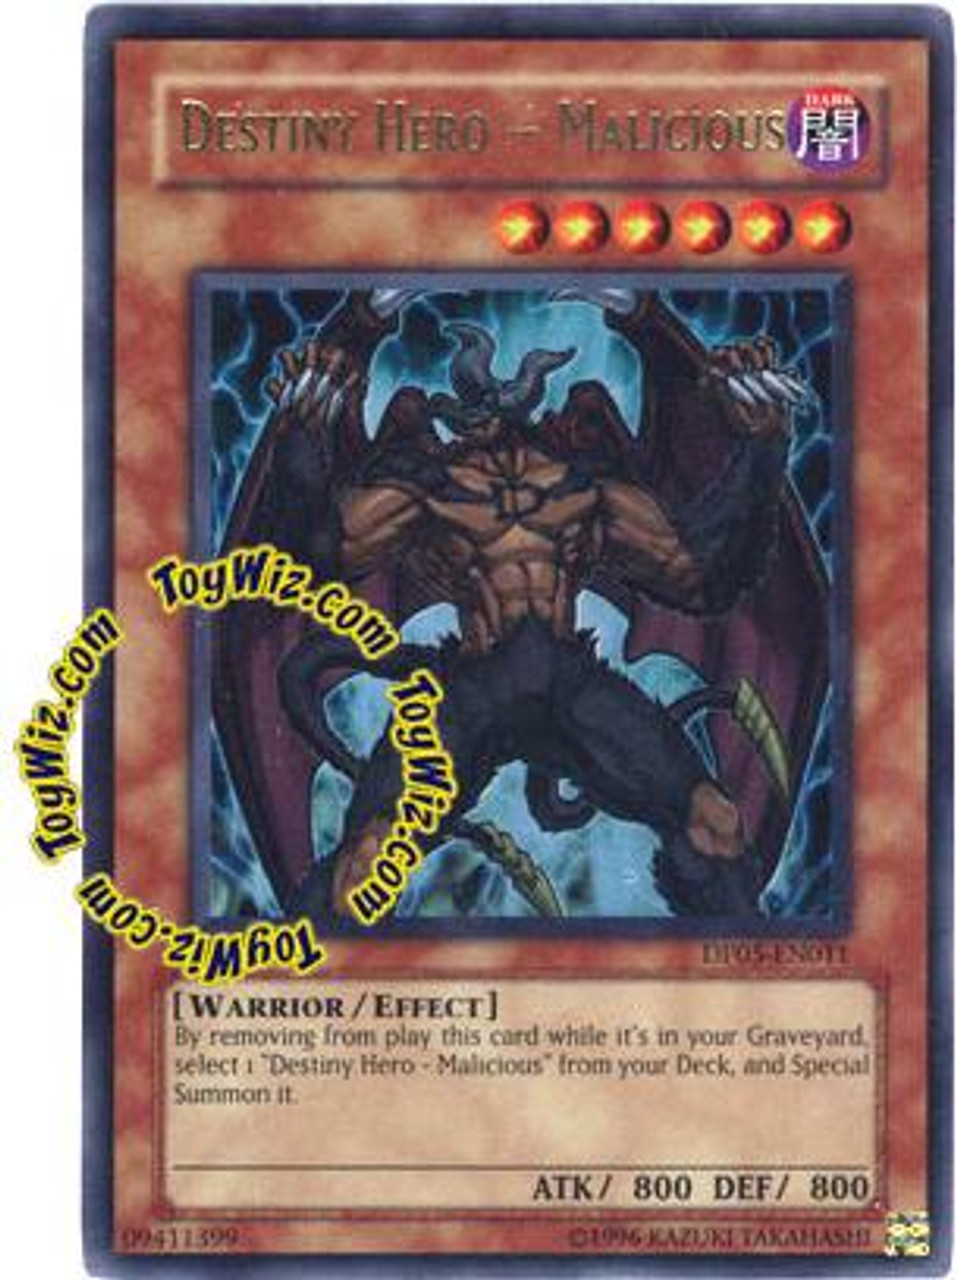 YuGiOh GX Duelist Series Aster Phoenix Ultra Rare Destiny Hero - Malicious DP05-EN011